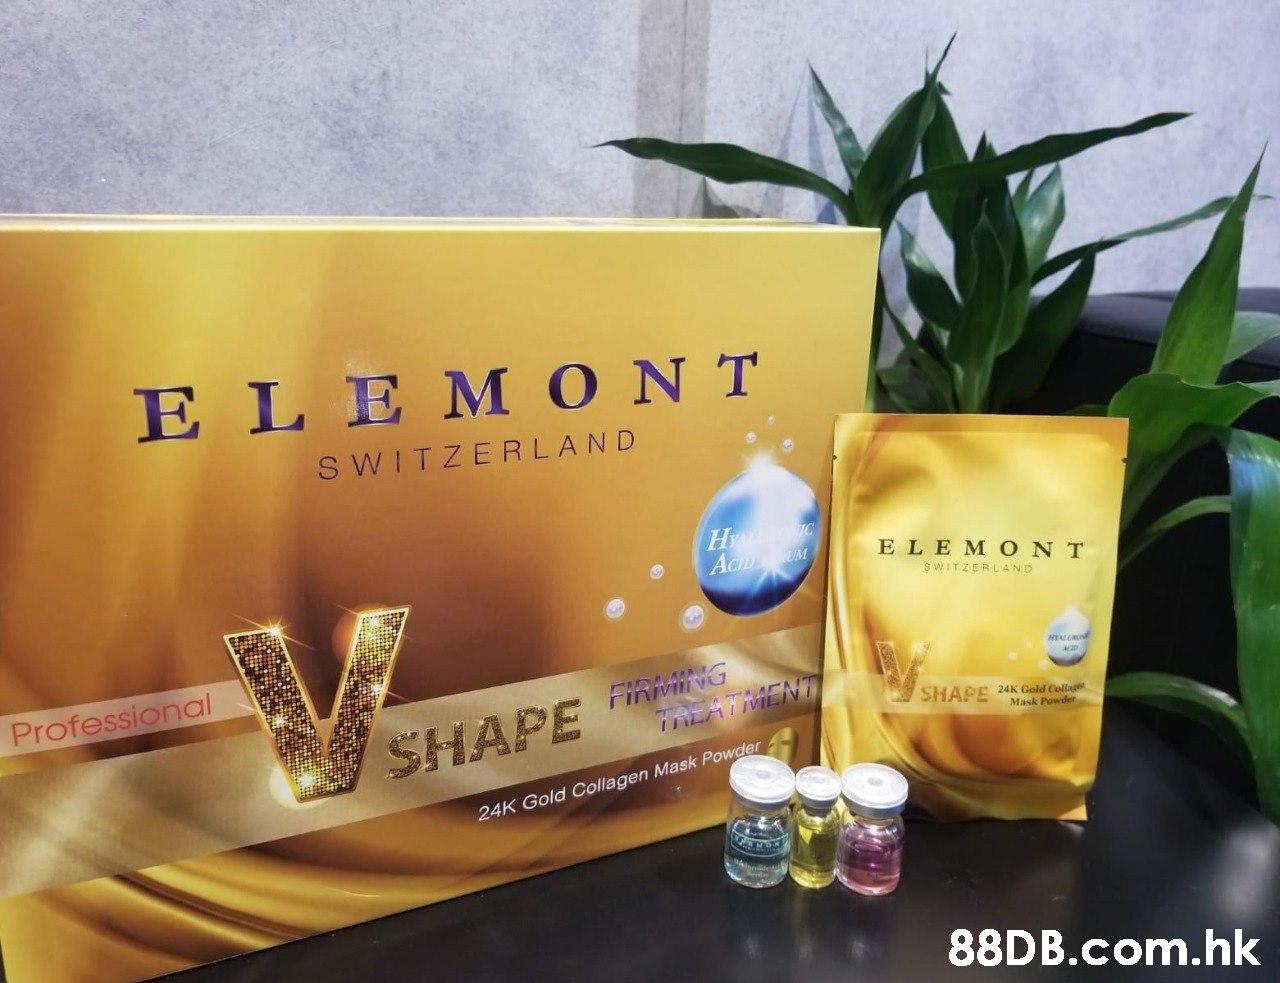 ELEM ONT S WITZERLAND ELEM ONT SWITZERLAND Professional rinivI VU SHAPE SHAPE 24K Gold Collage Mask Powder INLATMLINT 24K Gold Collagen Mask Powder .hk